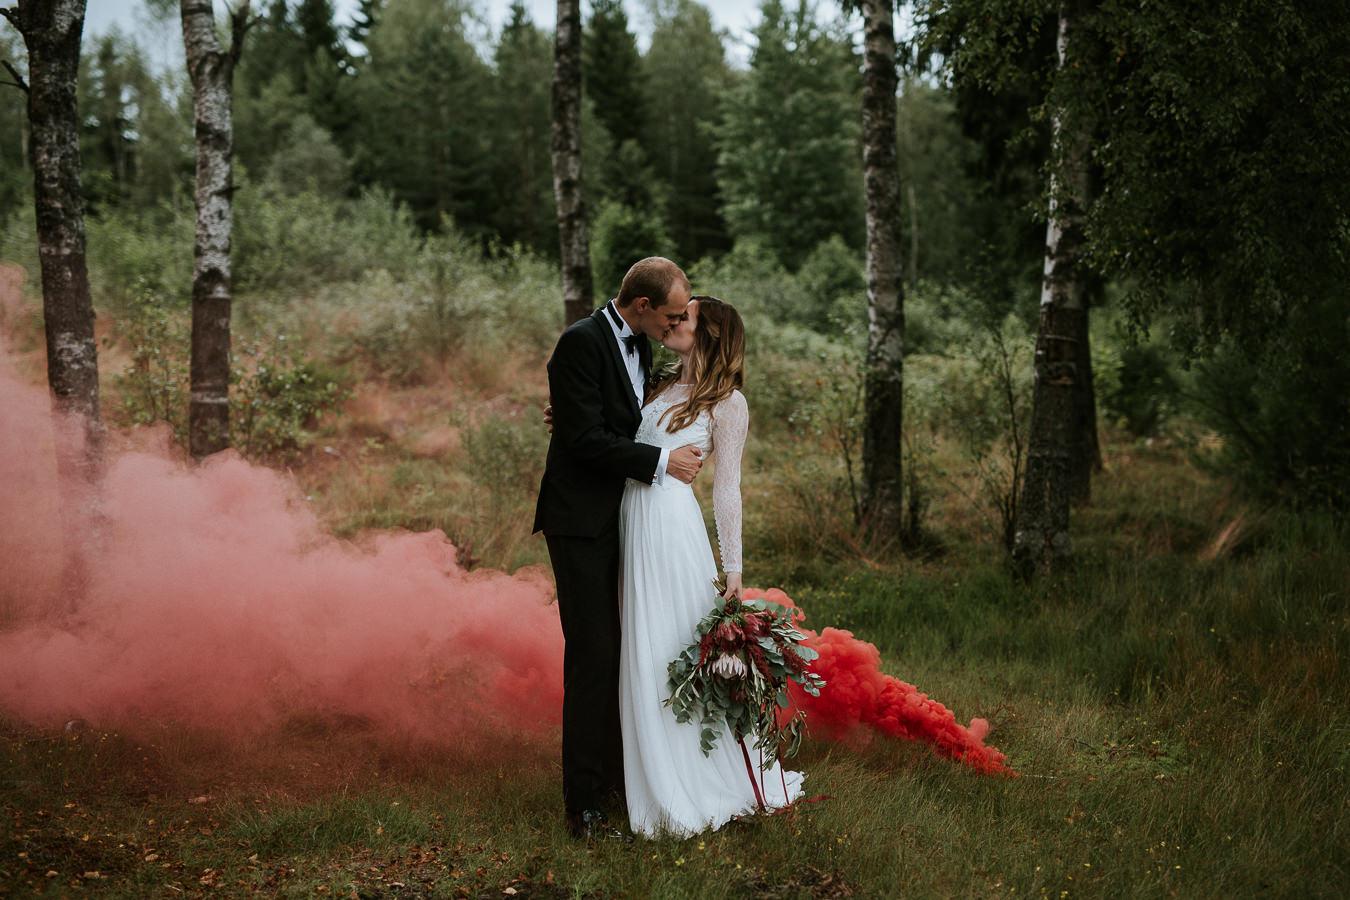 Bryllup-Lageret-Tofte-bryllupsfotograf-144.jpg